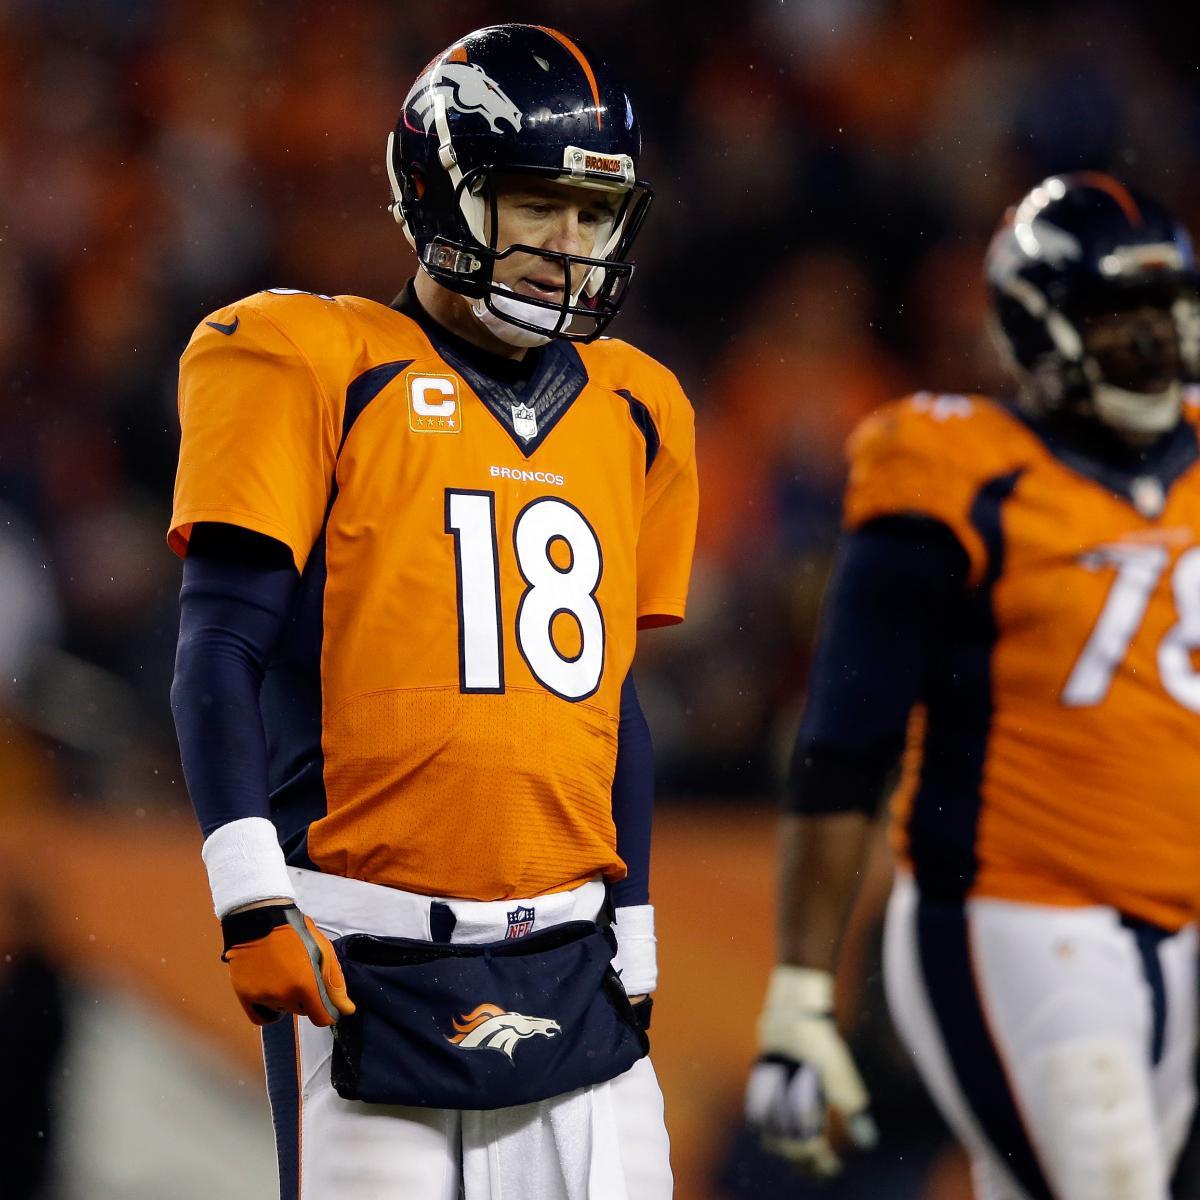 Is Peyton Manning Done As A Super Bowl-Caliber Quarterback